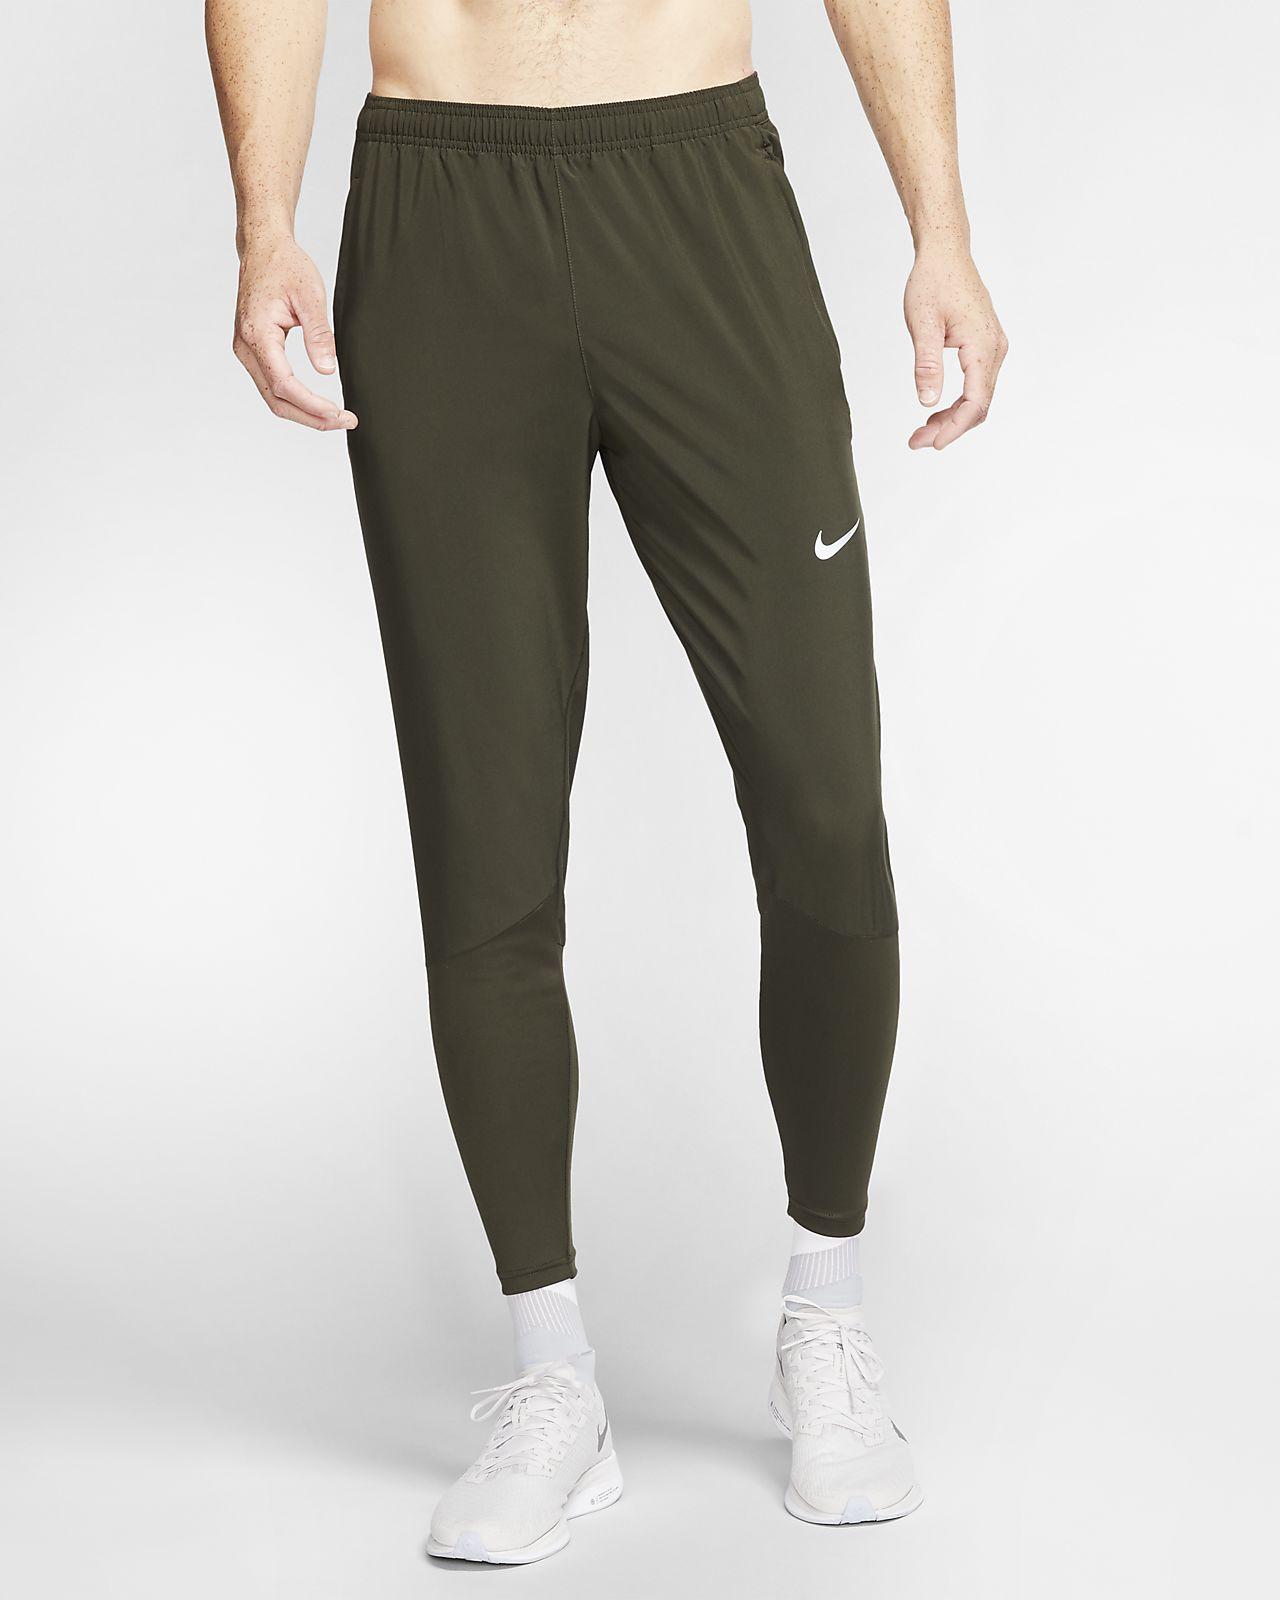 Pantalones de running para hombre Nike Phenom Essential